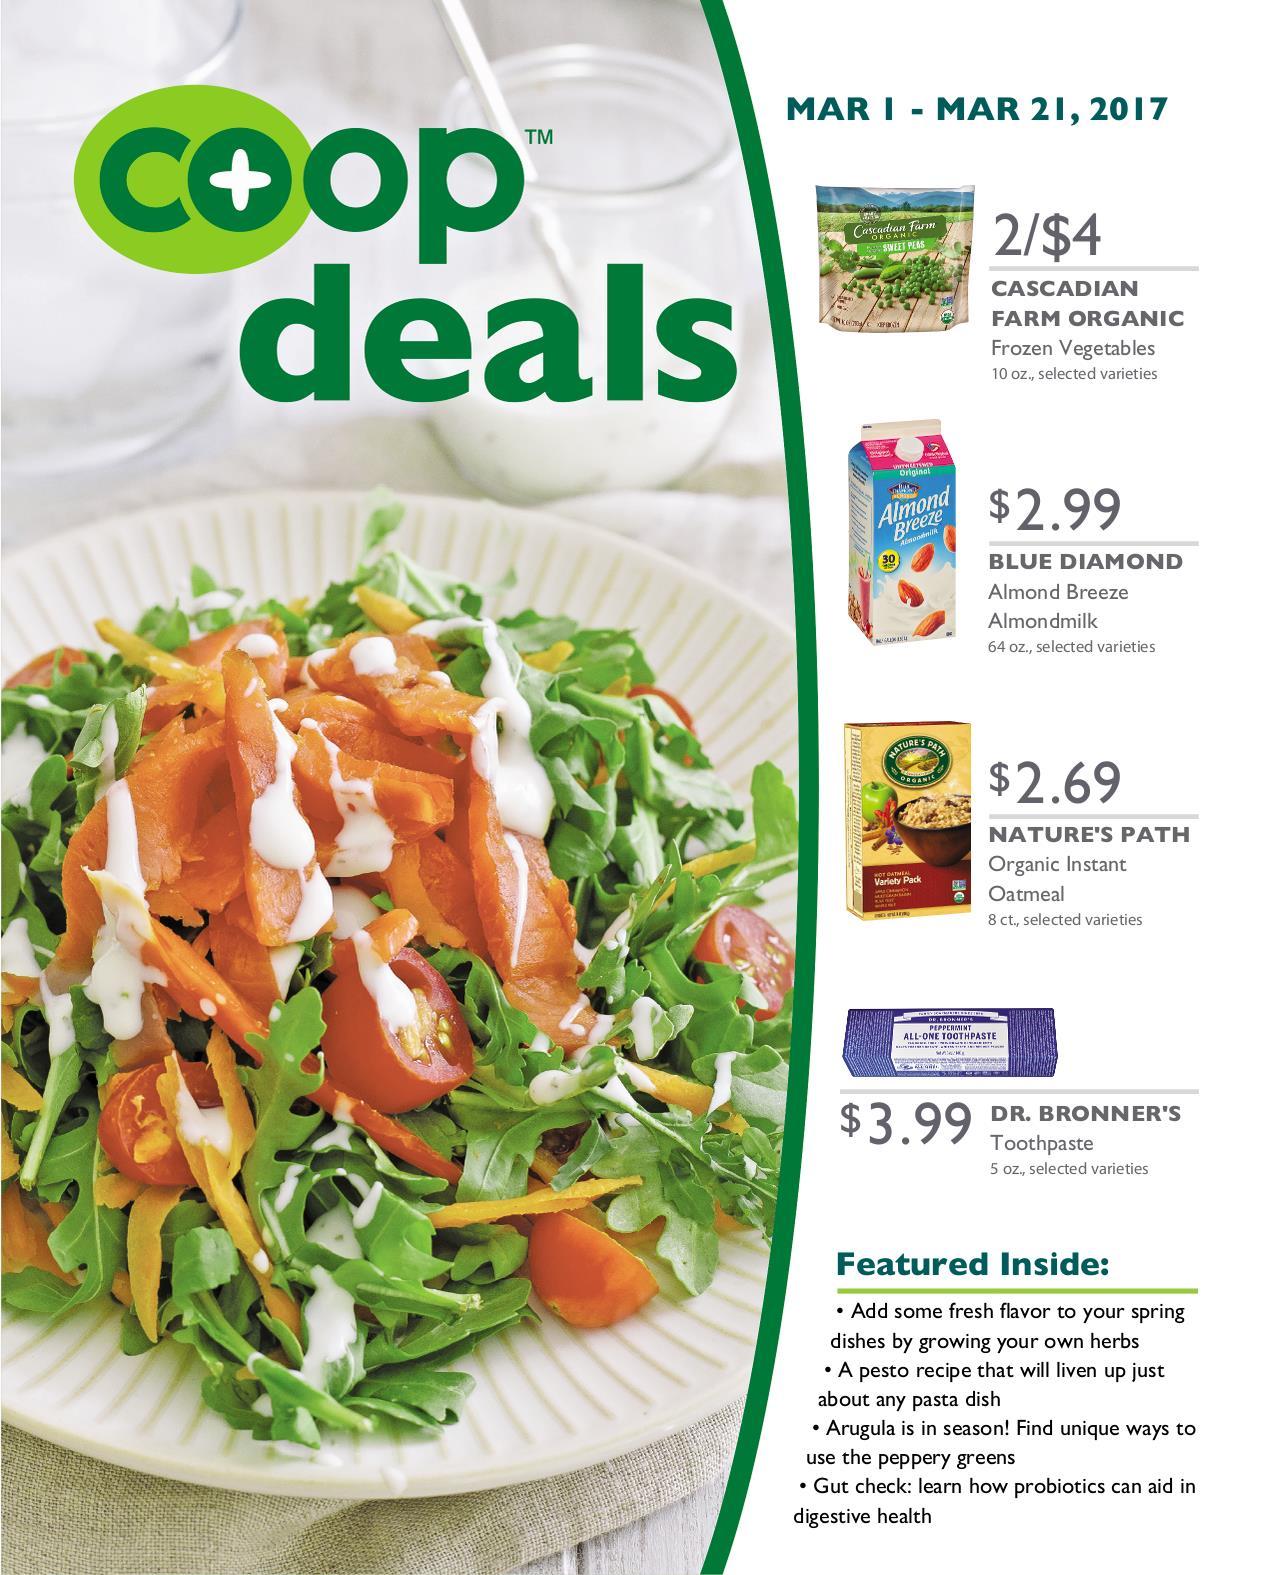 Co+op Deals Mar 2017 A